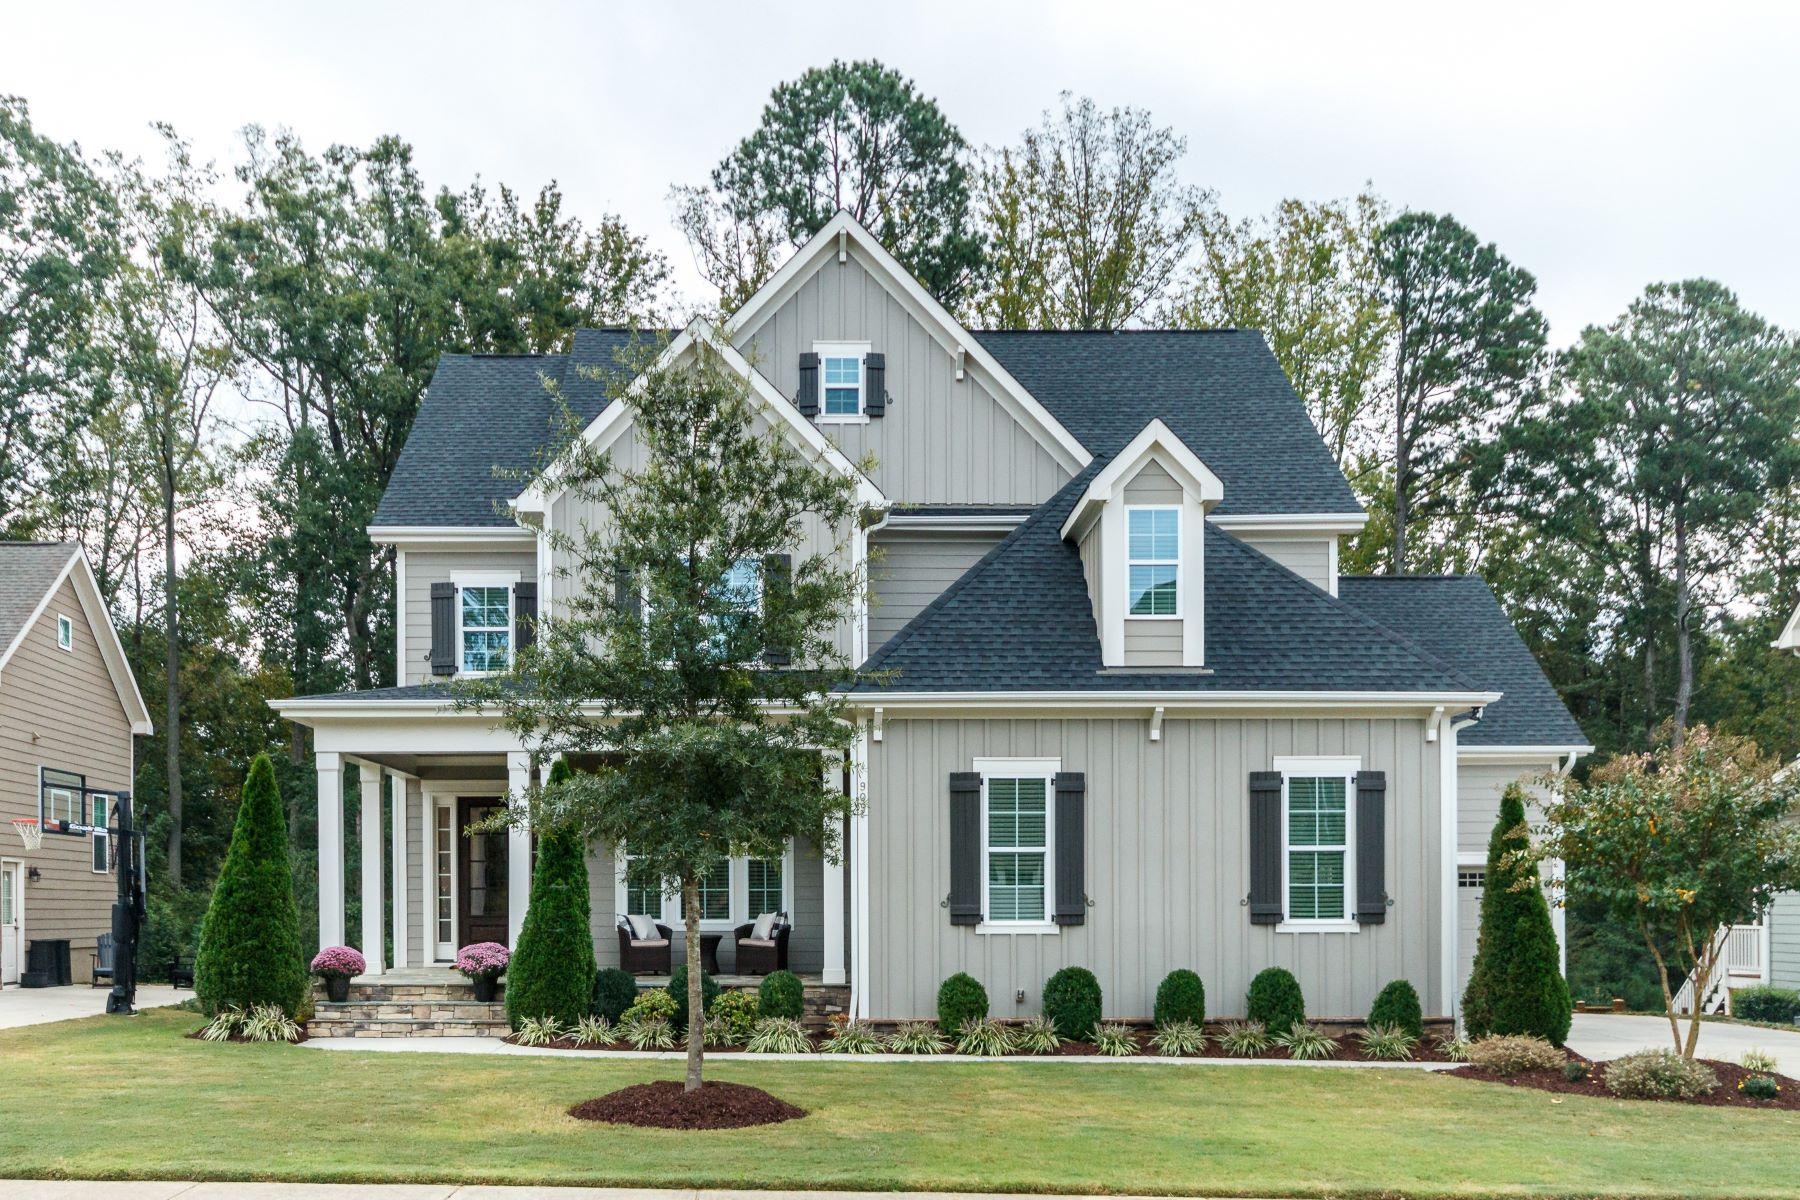 Single Family Homes for Sale at Custom Craftsman in Churchill Estates 909 Cambridge Hall Loop Apex, North Carolina 27539 United States